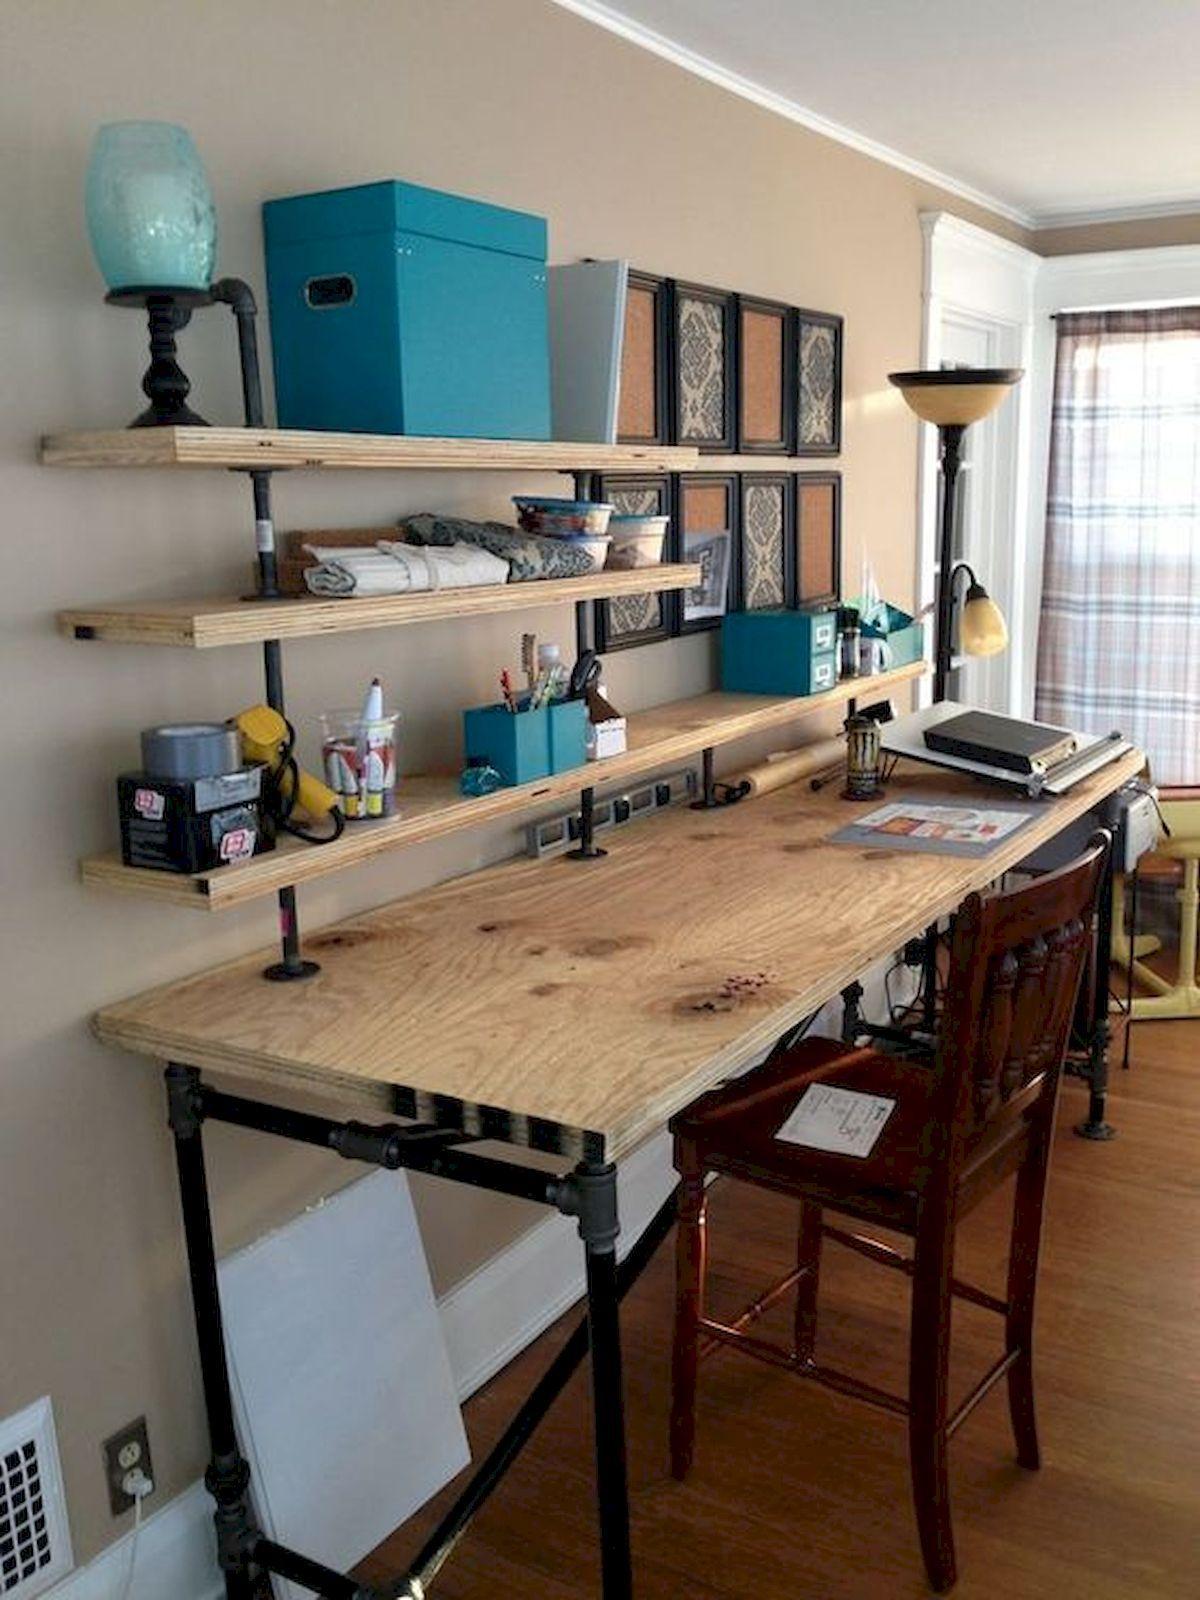 60 Favorite Diy Office Desk Design Ideas And Decor With Images Office Desk Designs Home Office Design Diy Office Desk